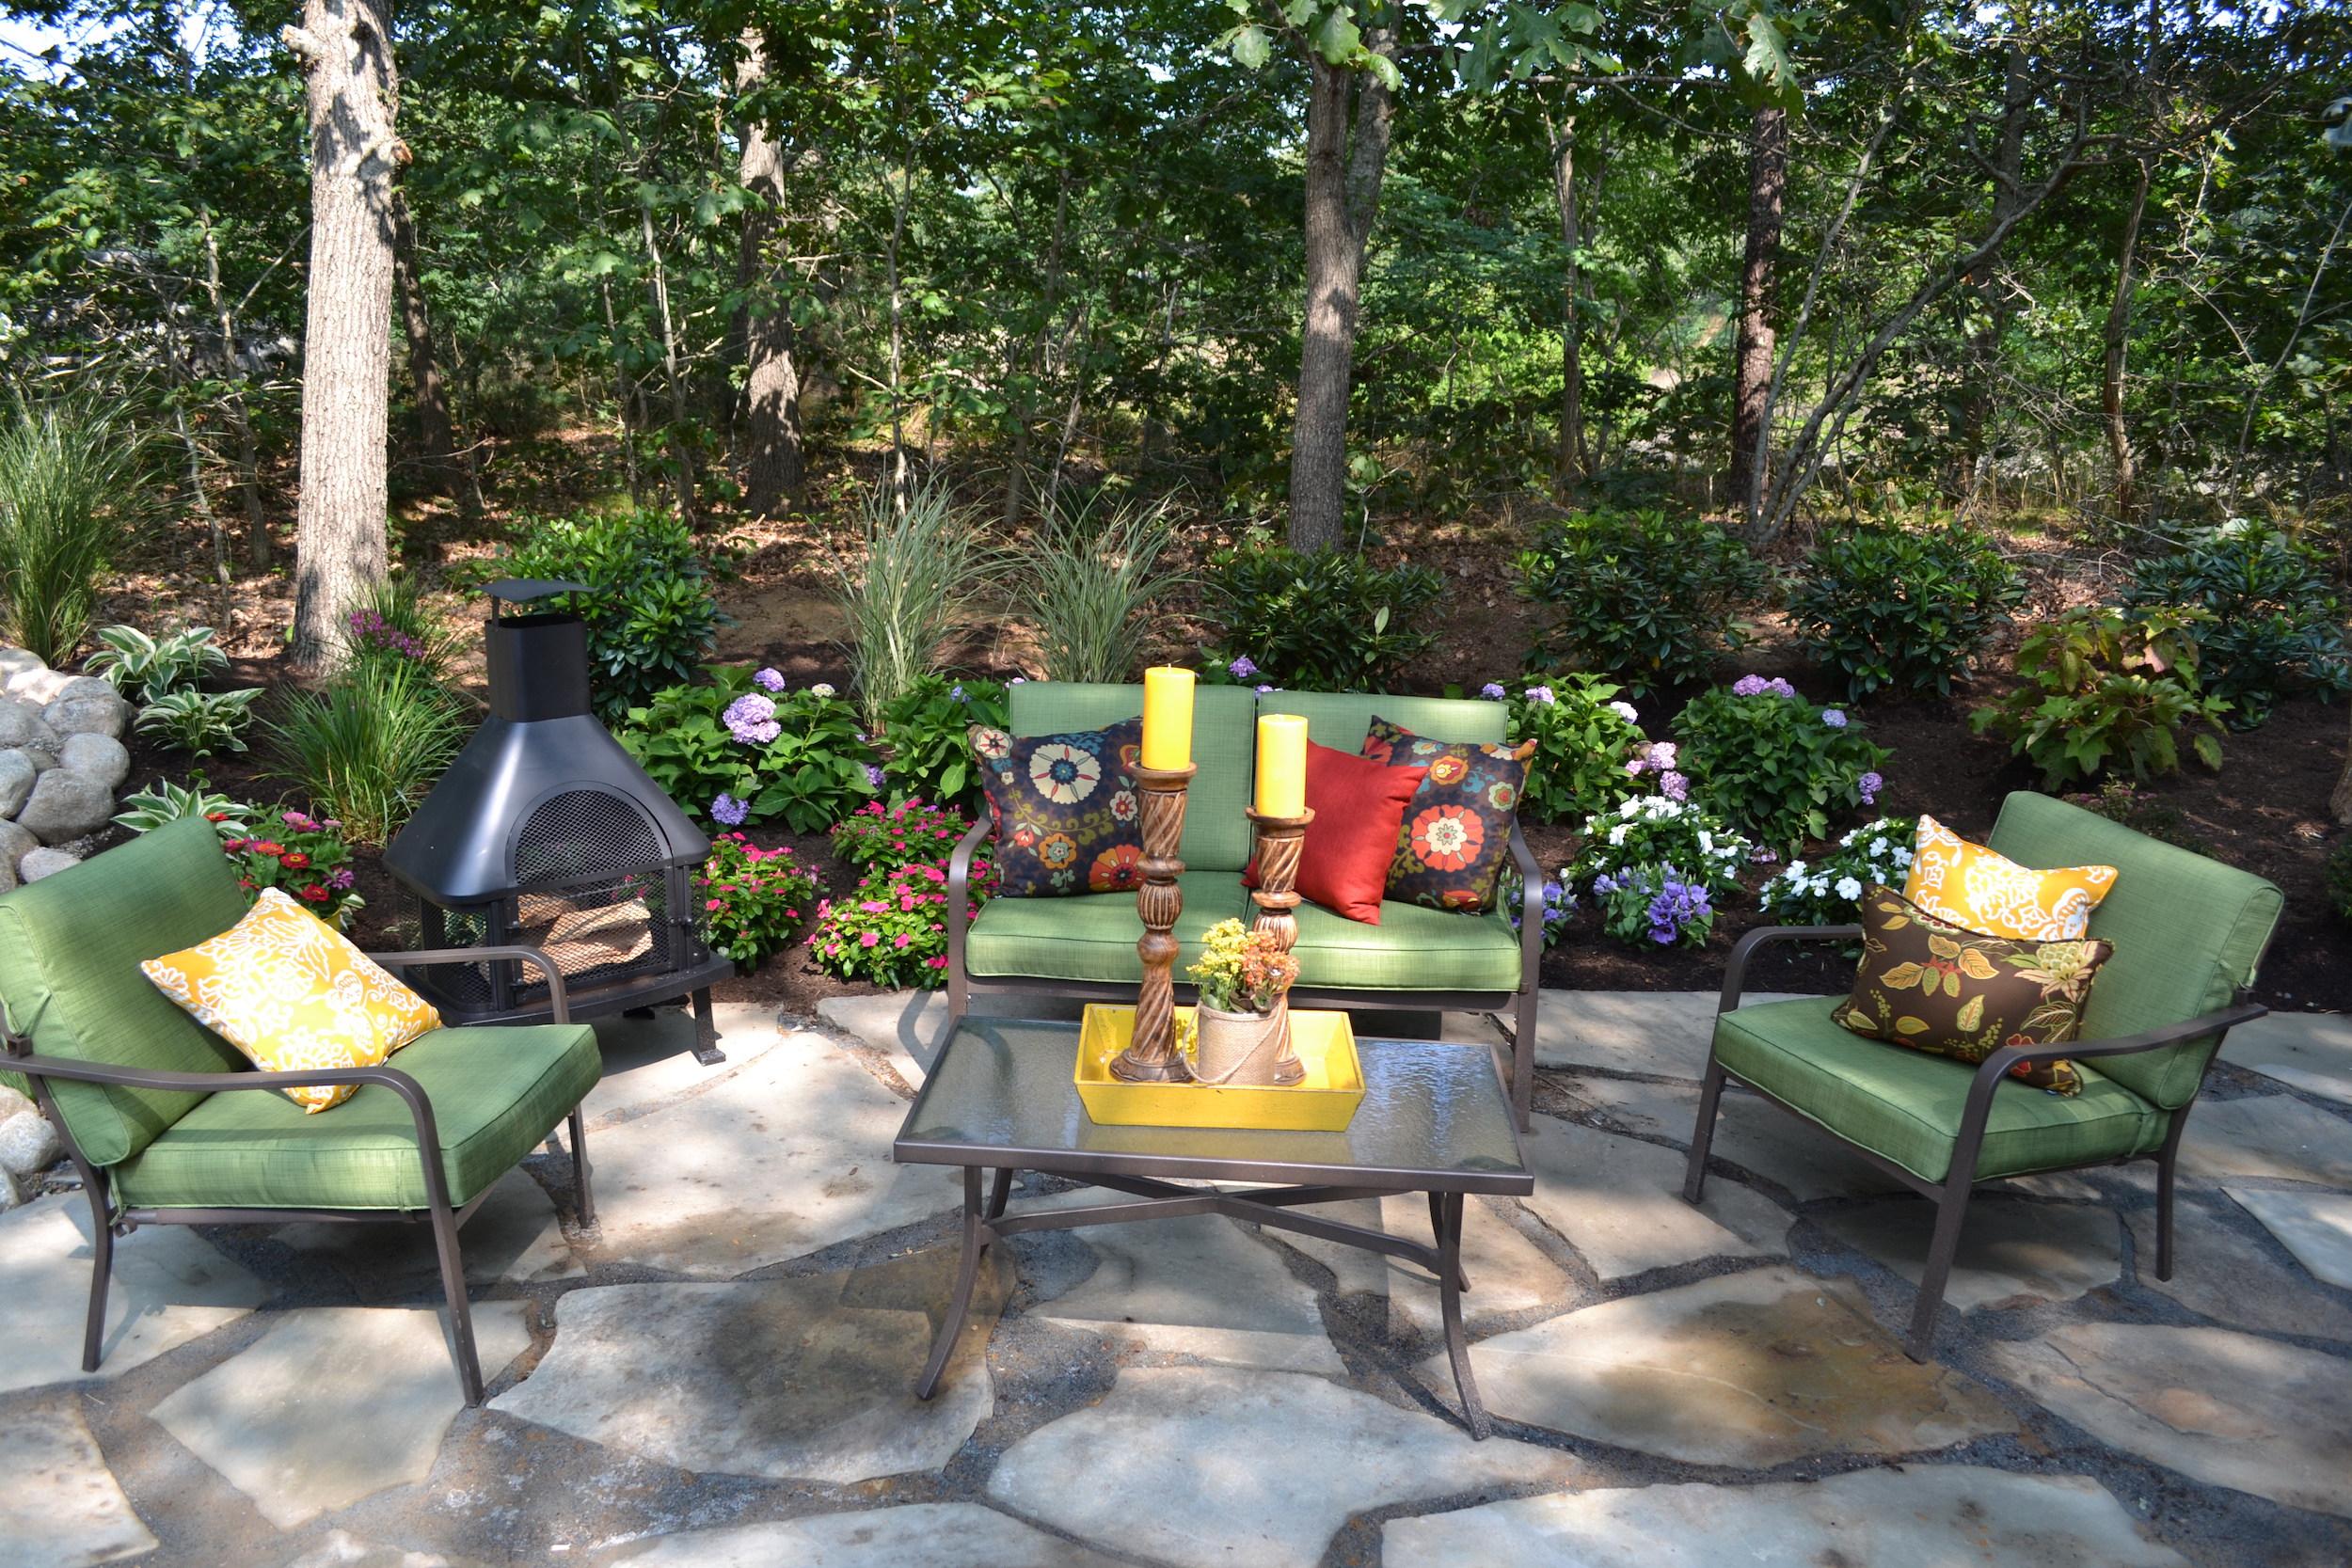 17 Low Maintenance Landscaping Ideas - Chris and Peyton ... on Low Maintenance Backyard Design  id=58974